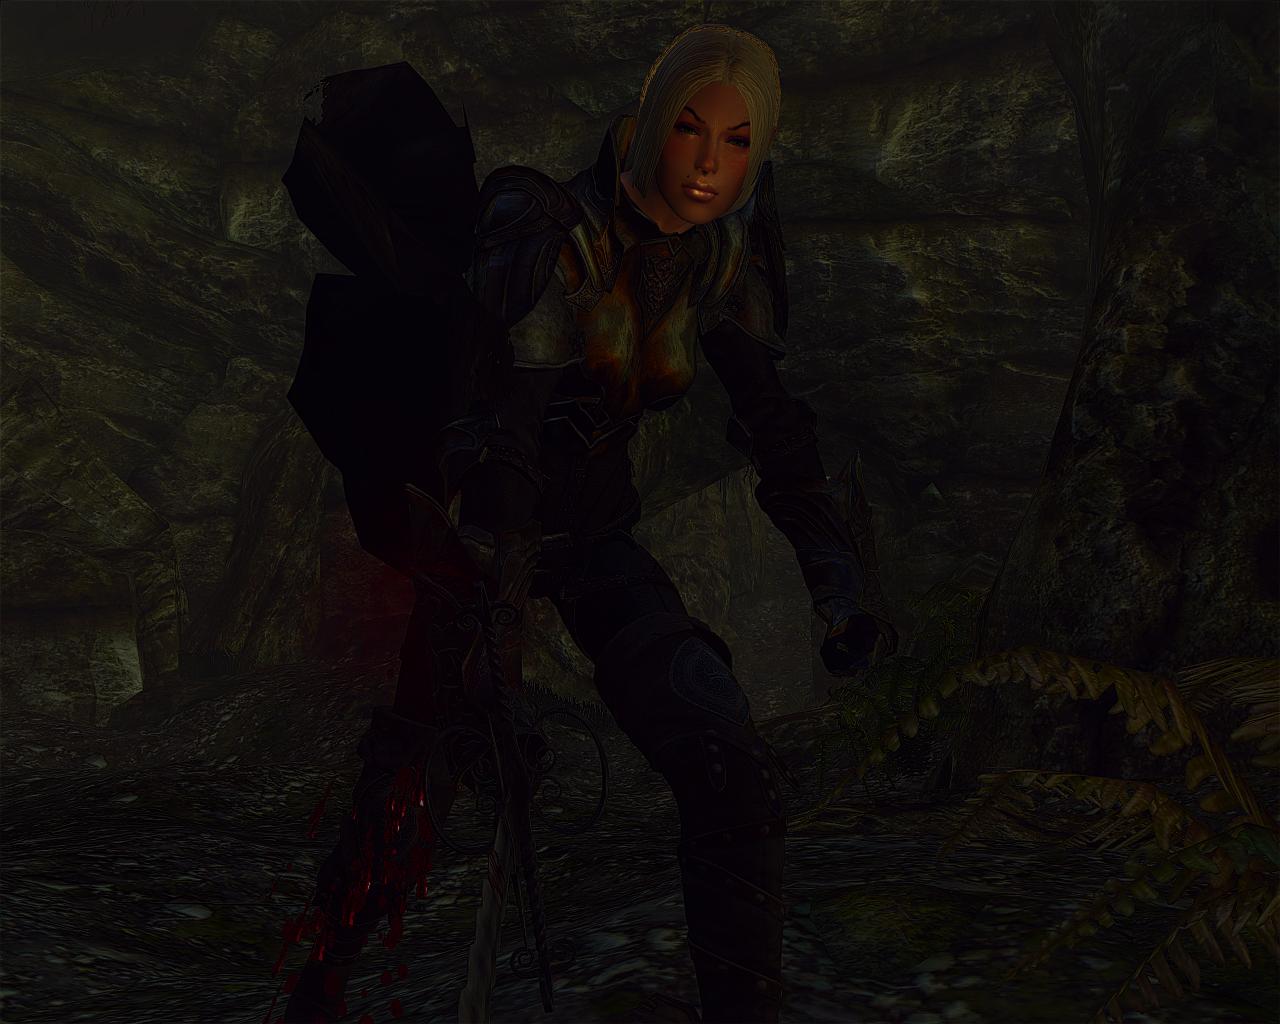 Screenshot29588.png - Elder Scrolls 5: Skyrim, the